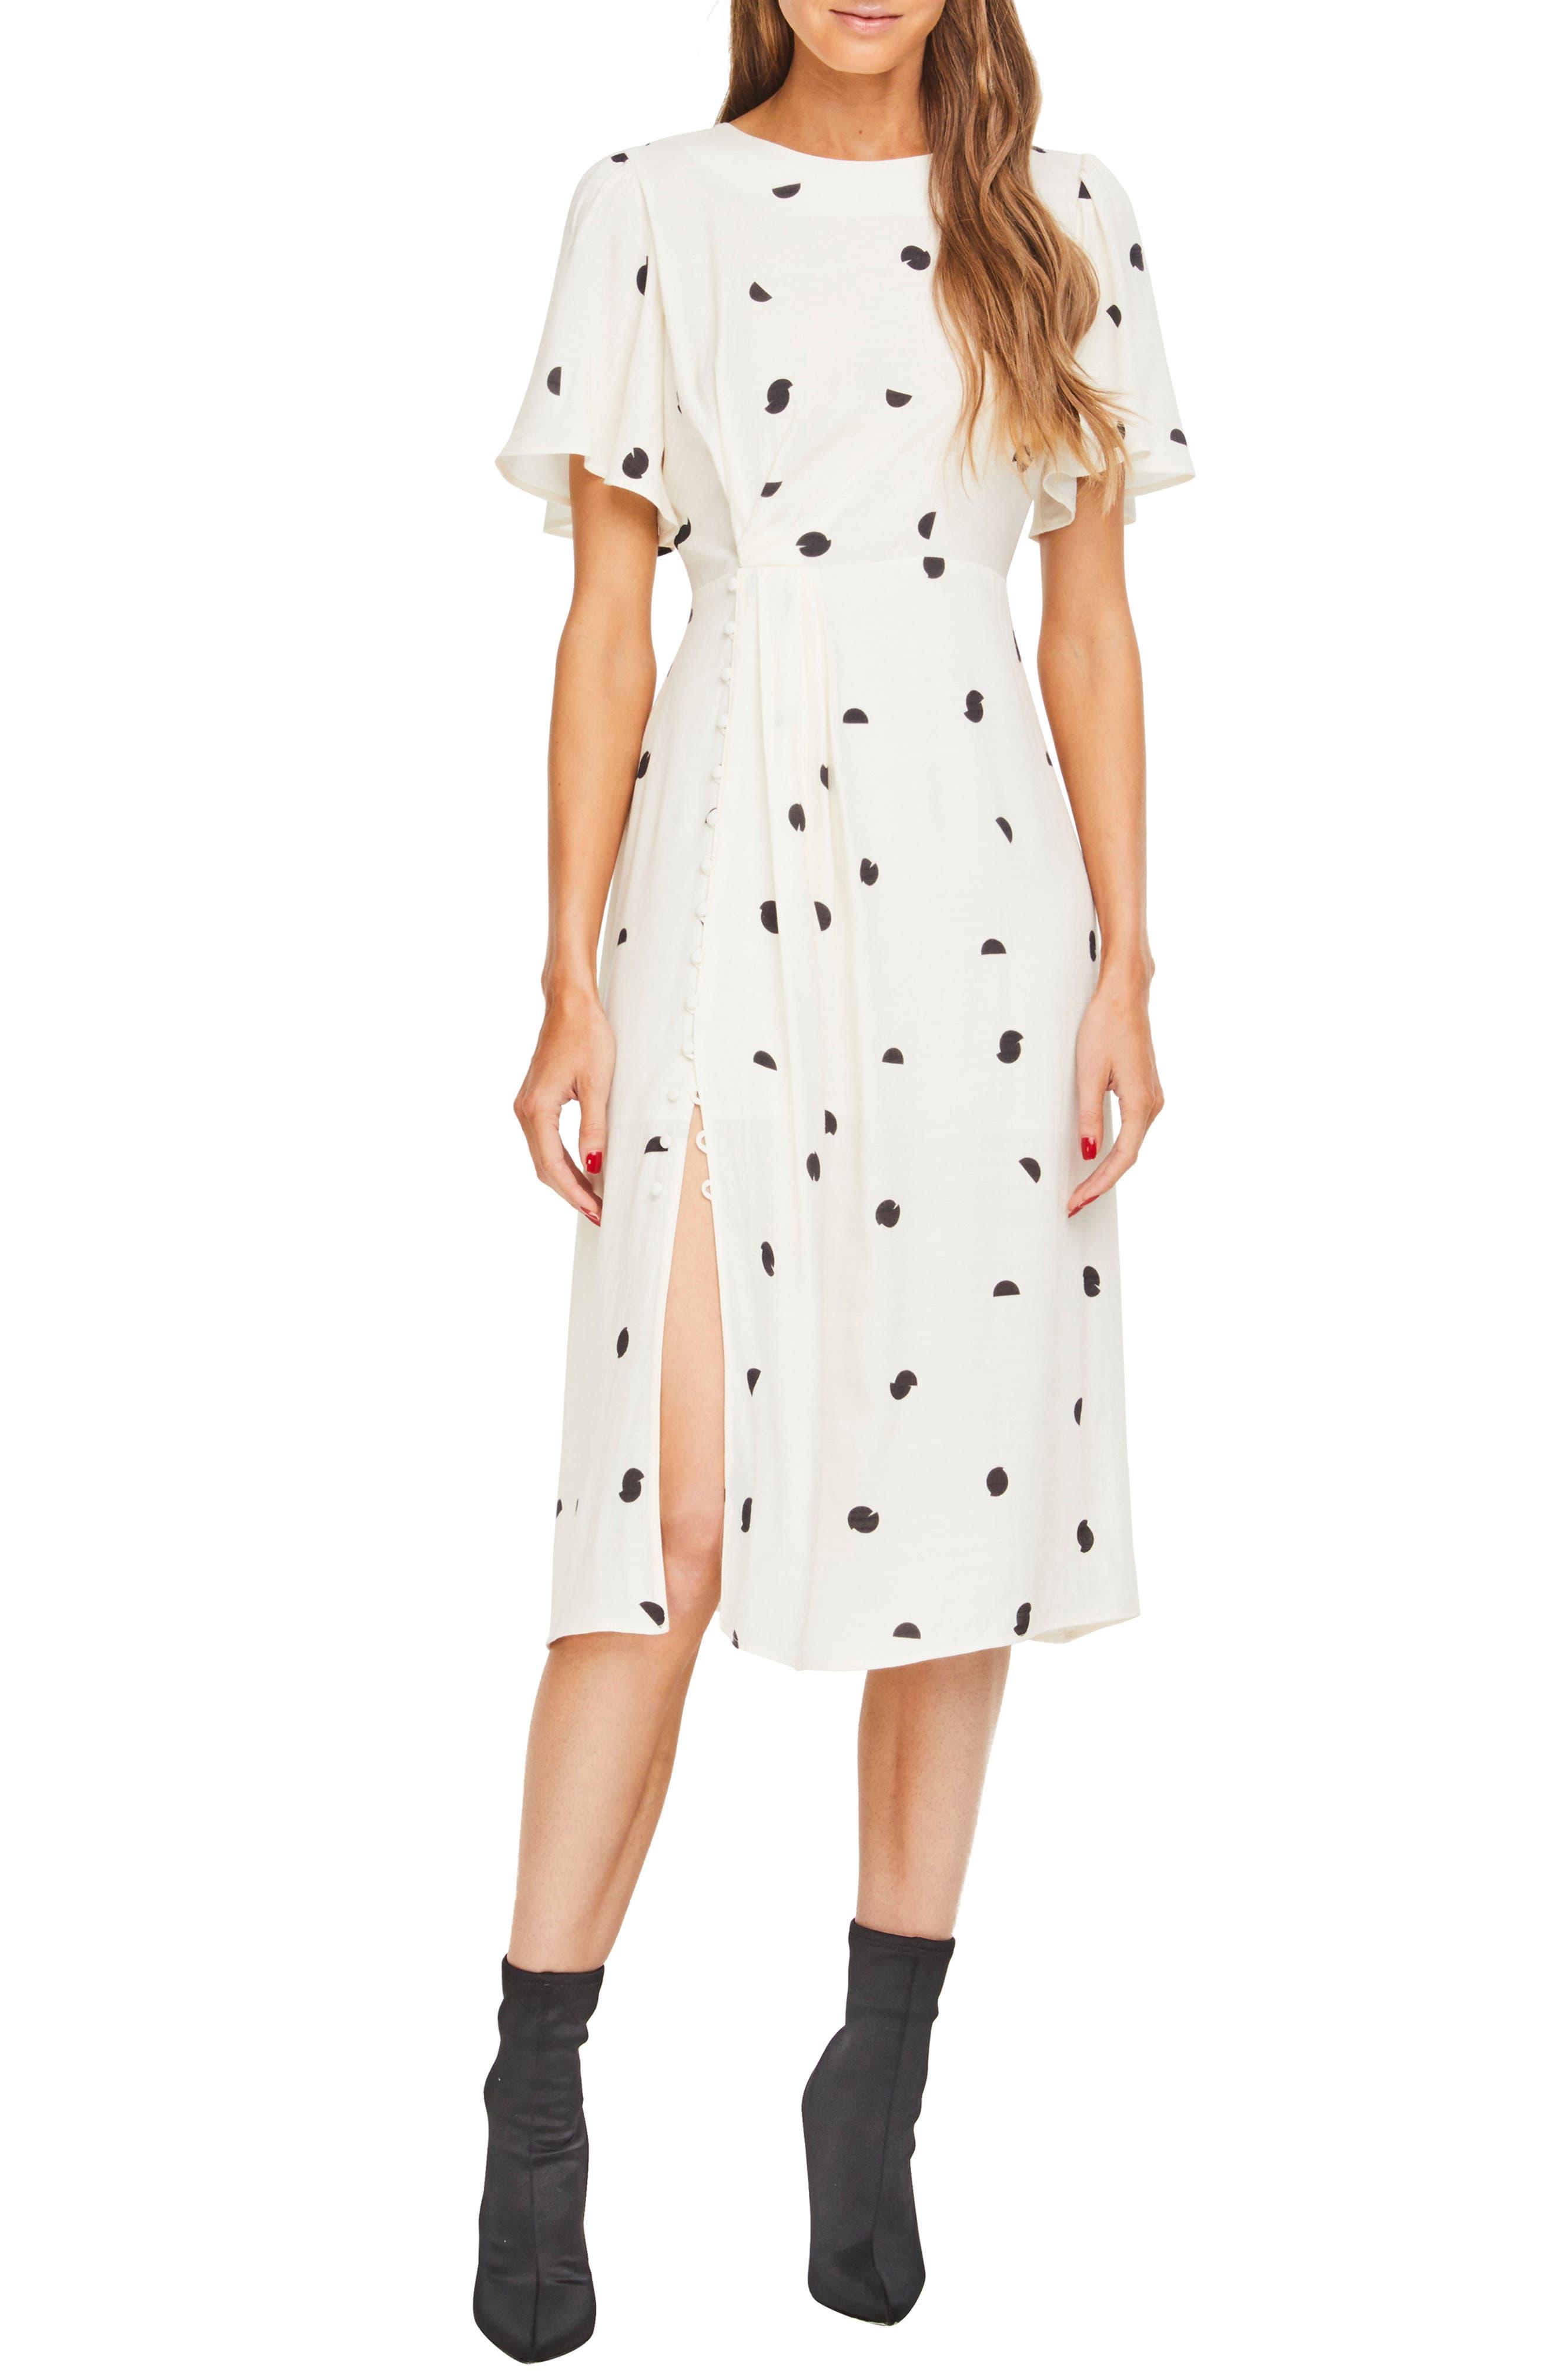 ASTR THE LABEL,                             Ebony Dress,                             Main thumbnail 1, color,                             900